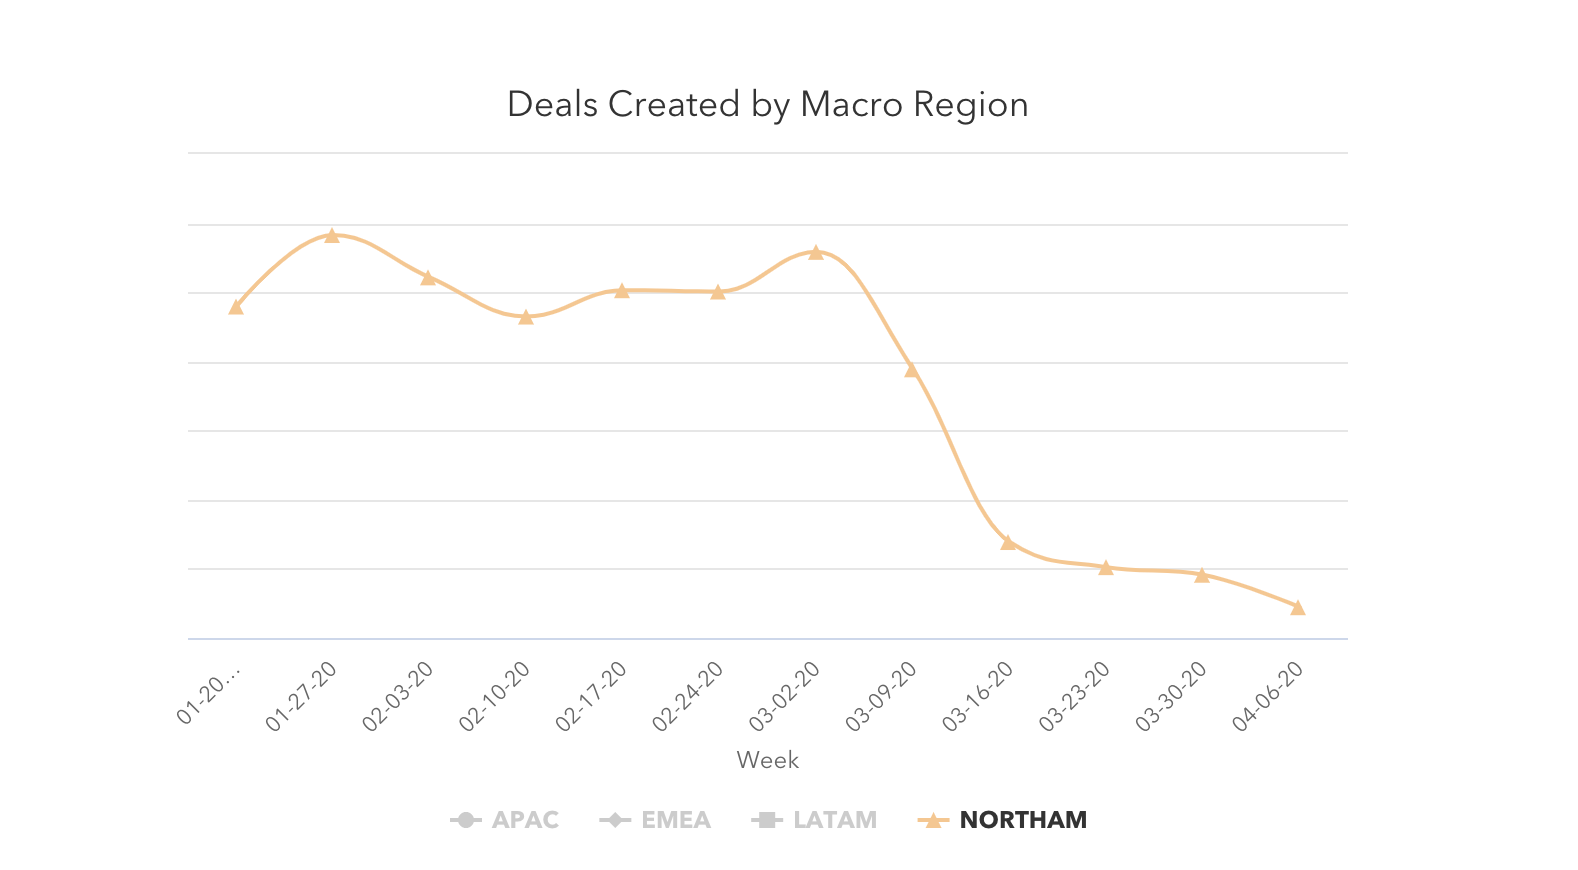 Deals created by macro region